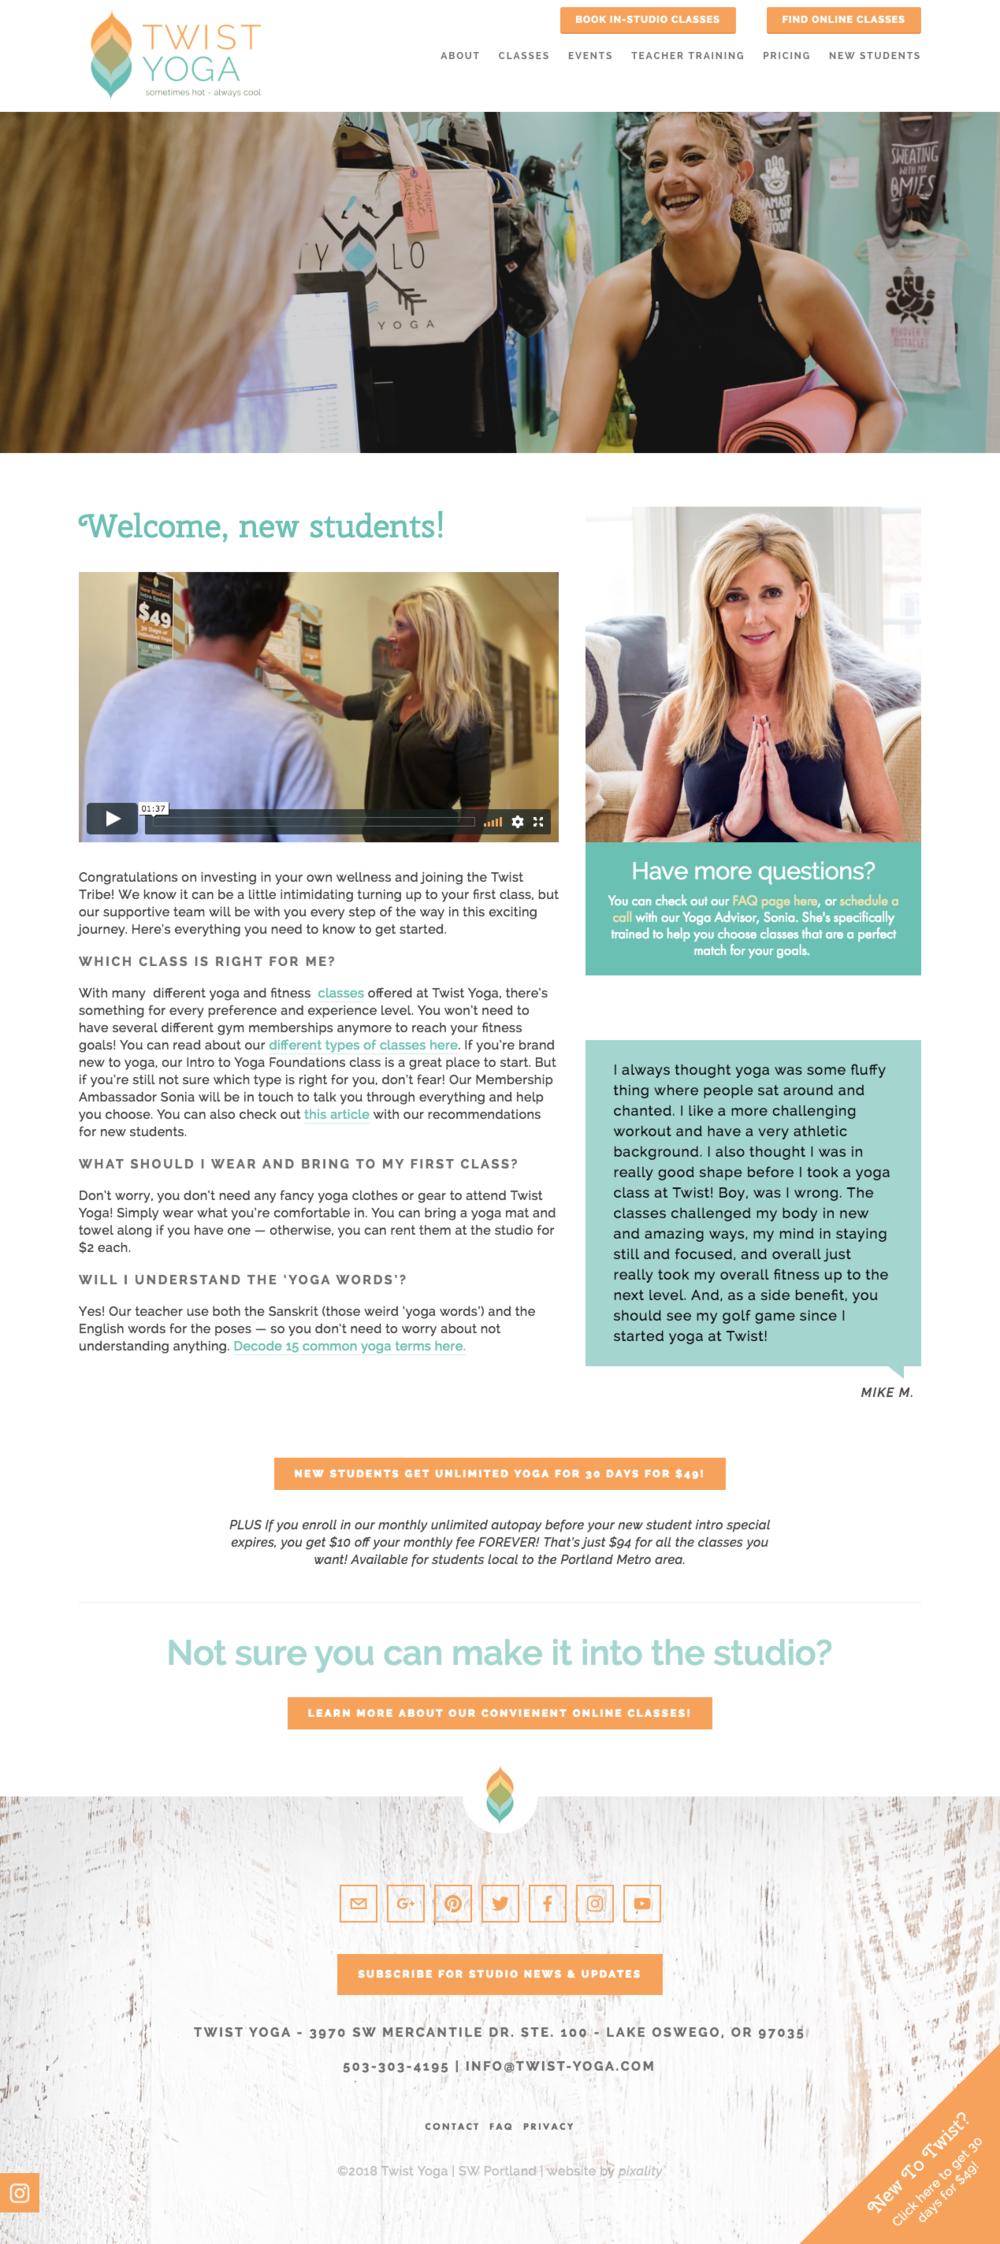 MINDBODY integrated Yoga Studio website